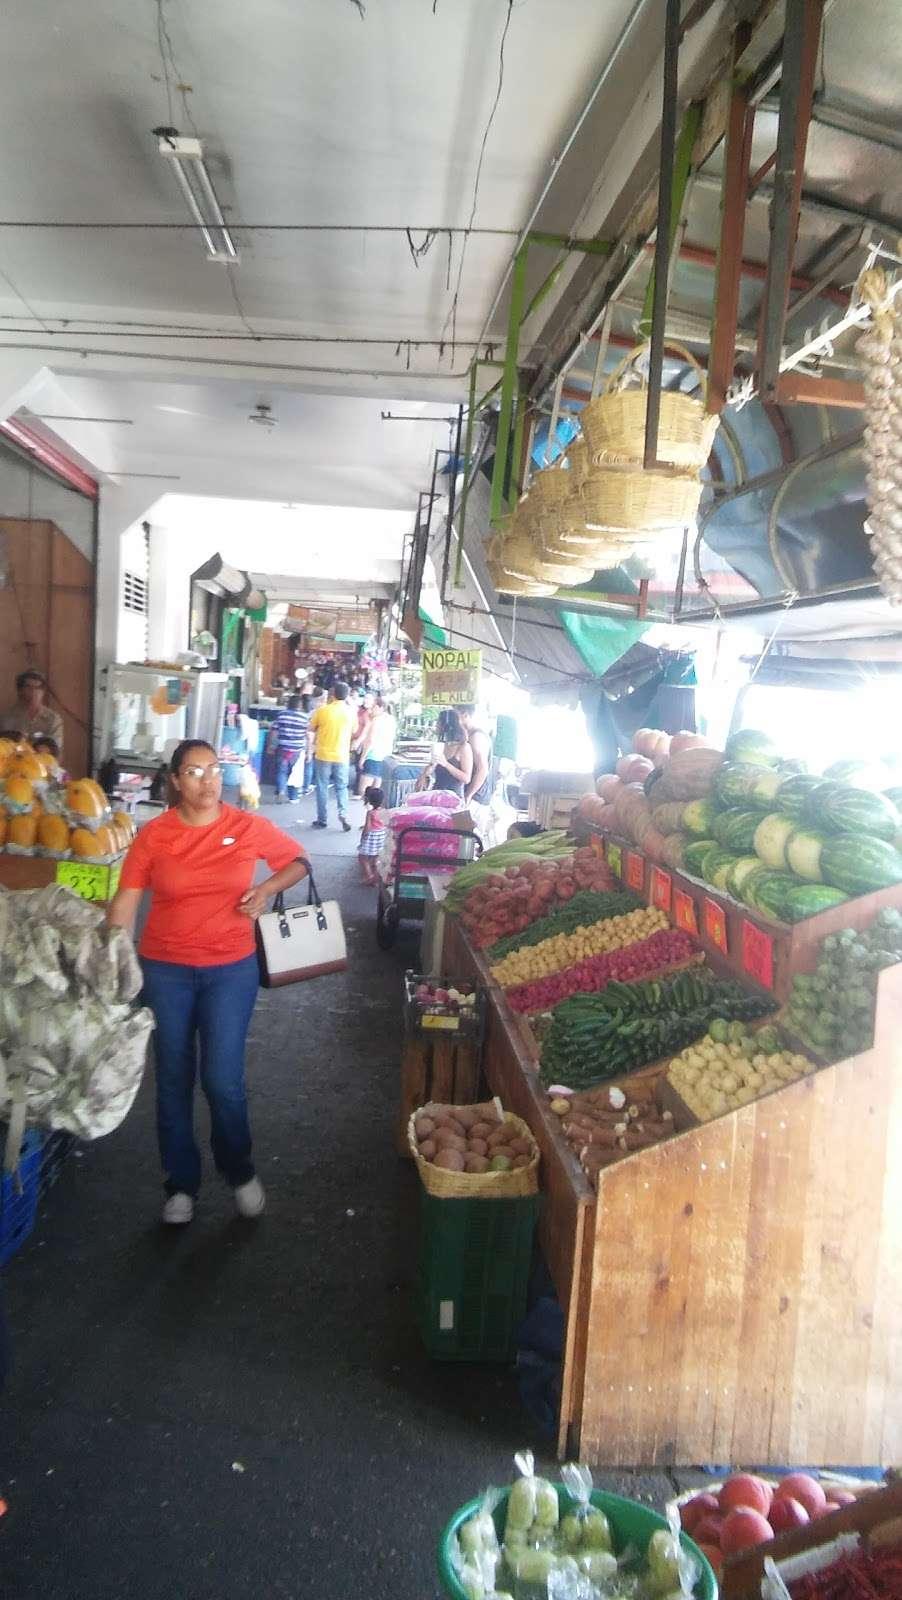 Mercado Municipal - store  | Photo 4 of 10 | Address: Niños Heroes, Zona Centro, 22000 Tijuana, B.C., Mexico